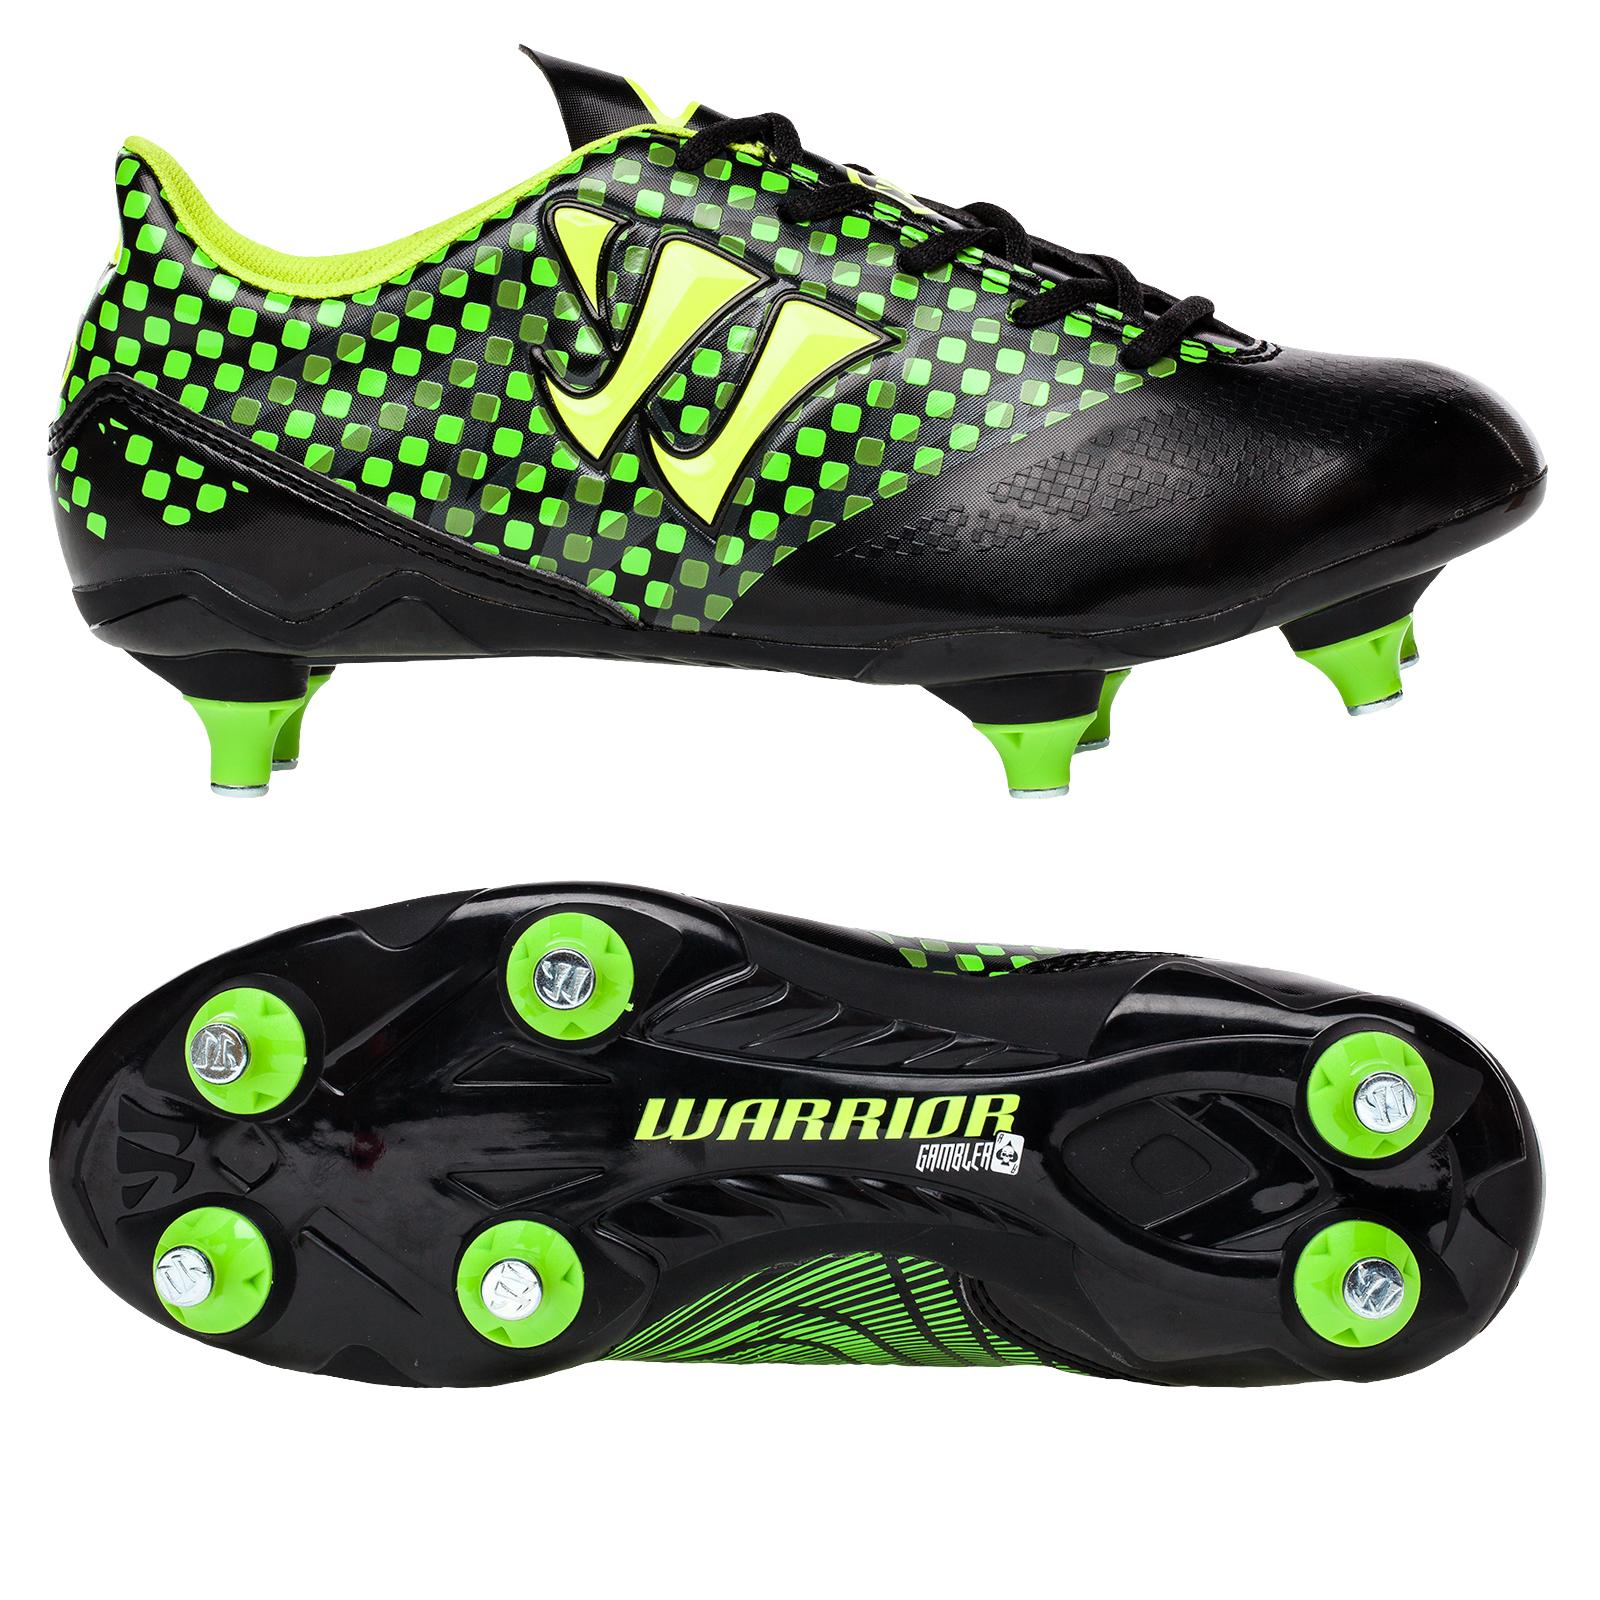 Warrior Sports Gambler Combat Soft Ground Football Boots -Blk/Grn-Junior Black